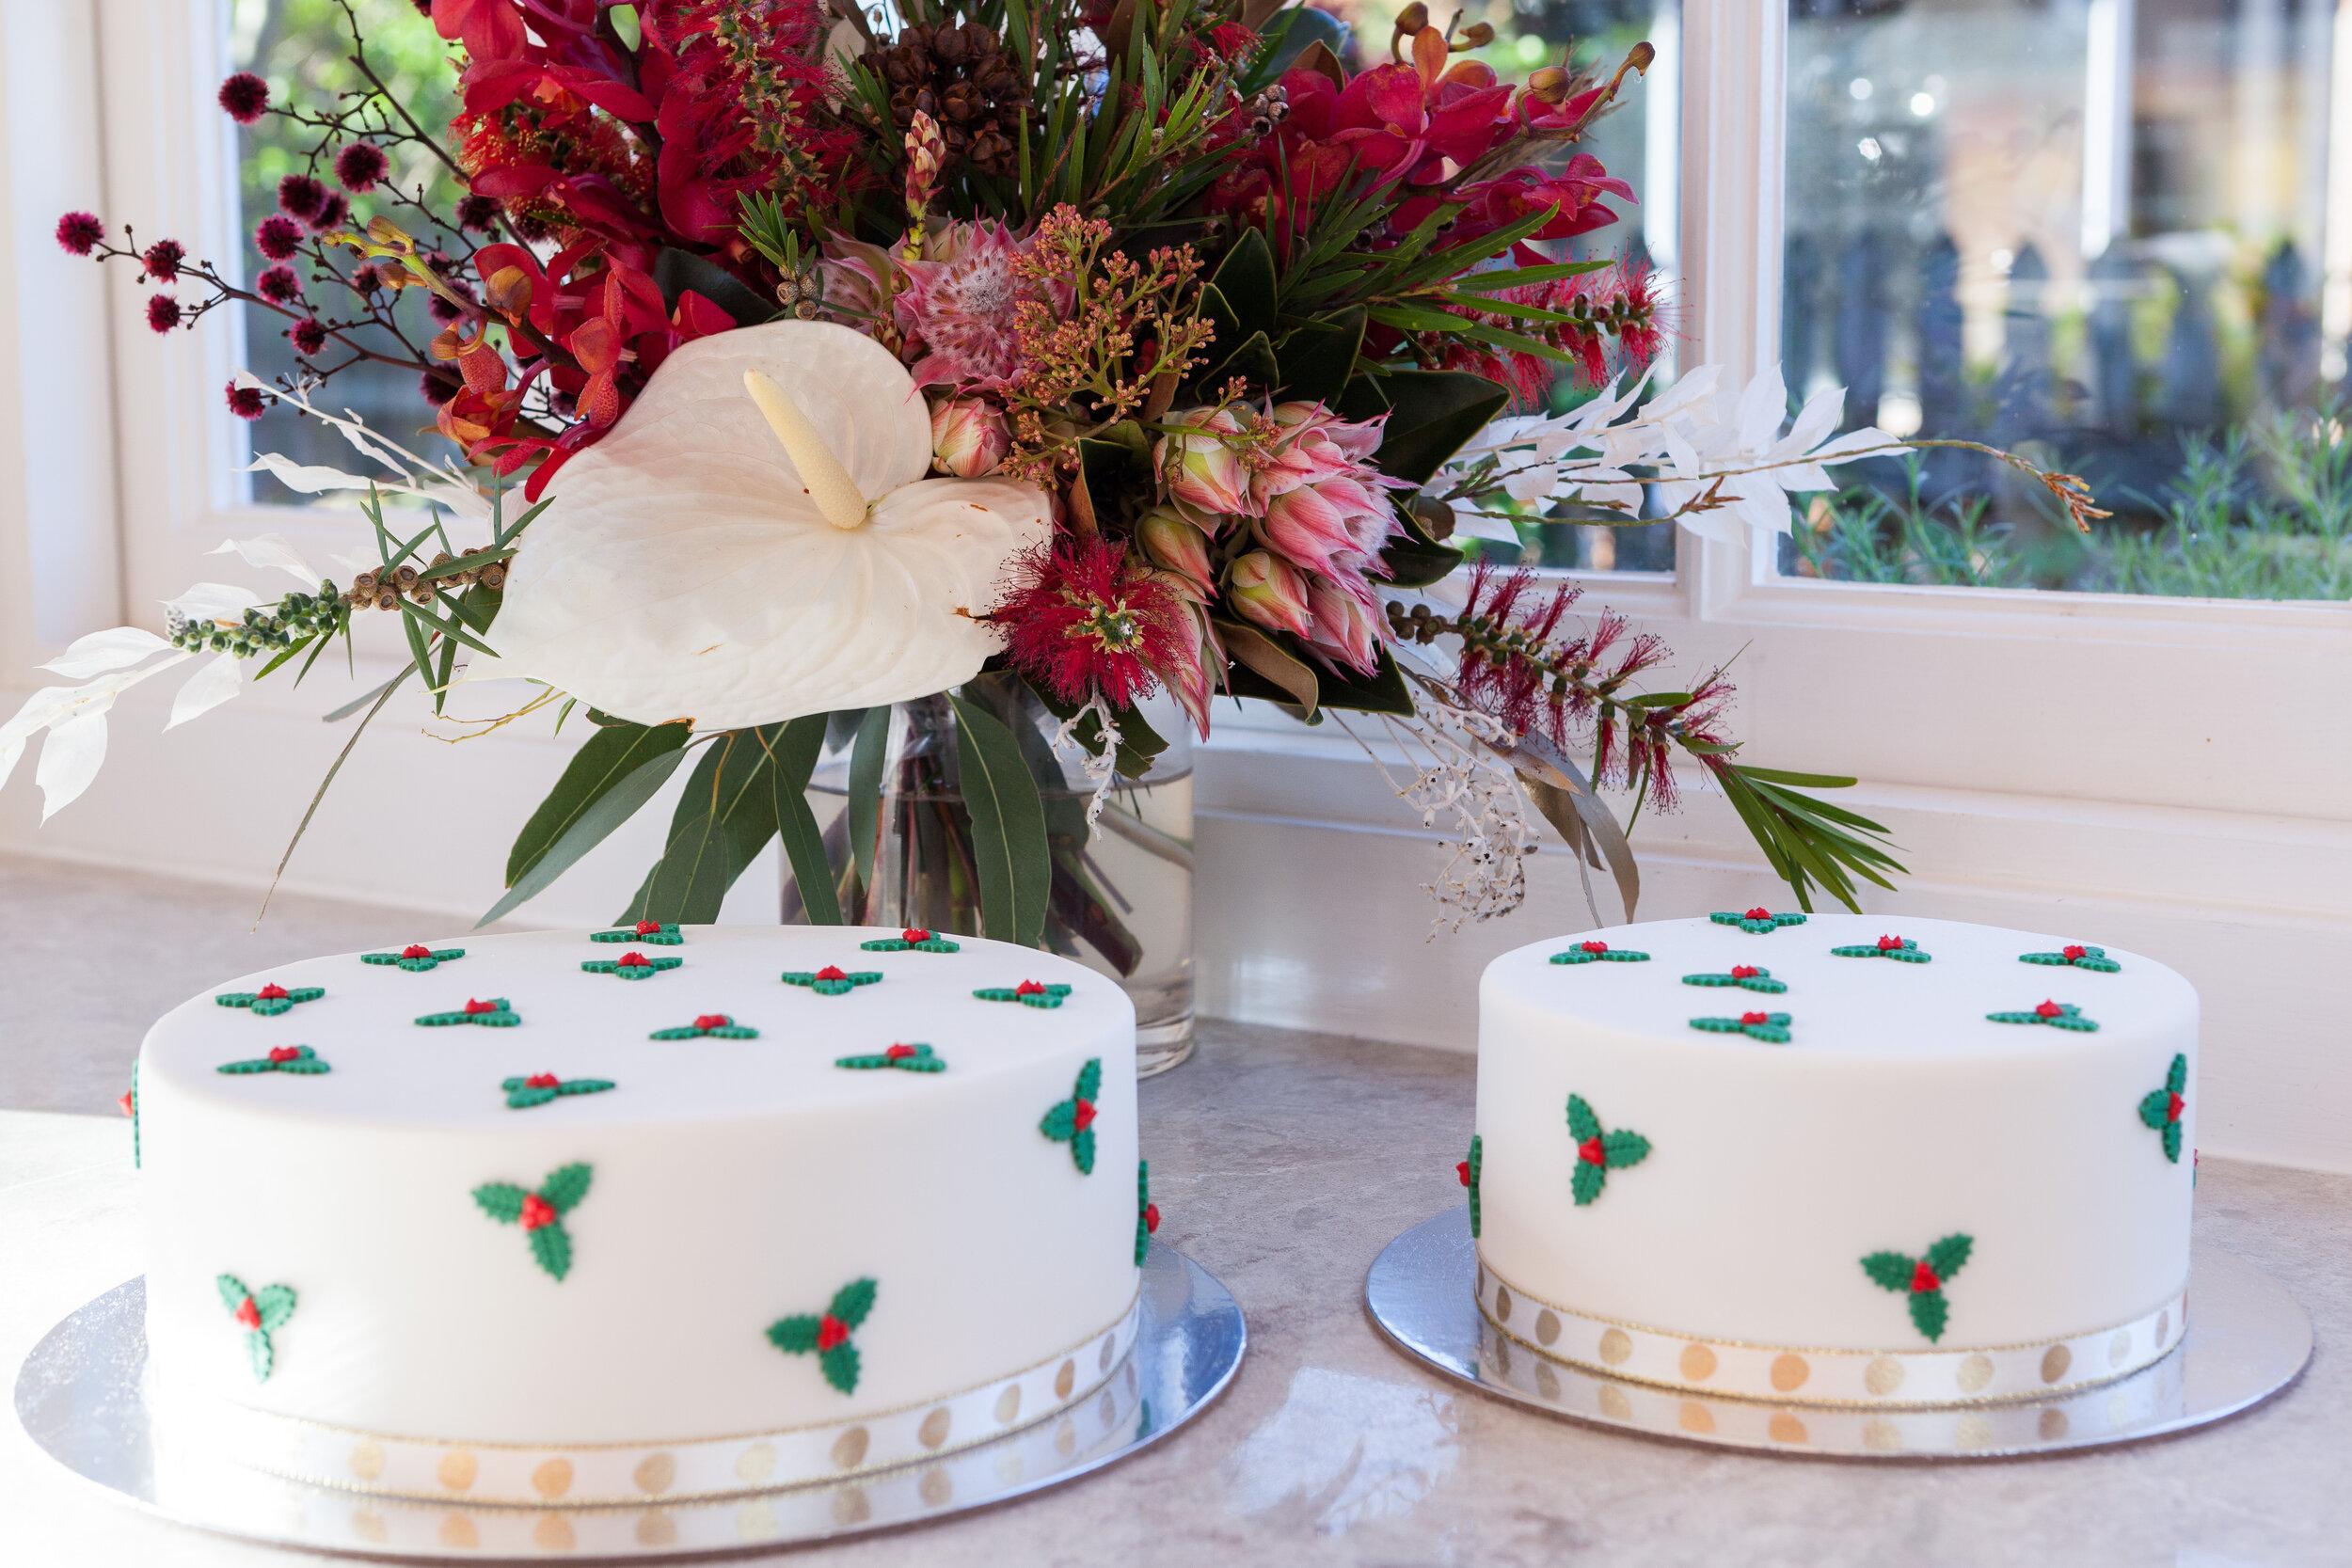 Vanillapodspecialtycakes_Christmas2019-19.jpg